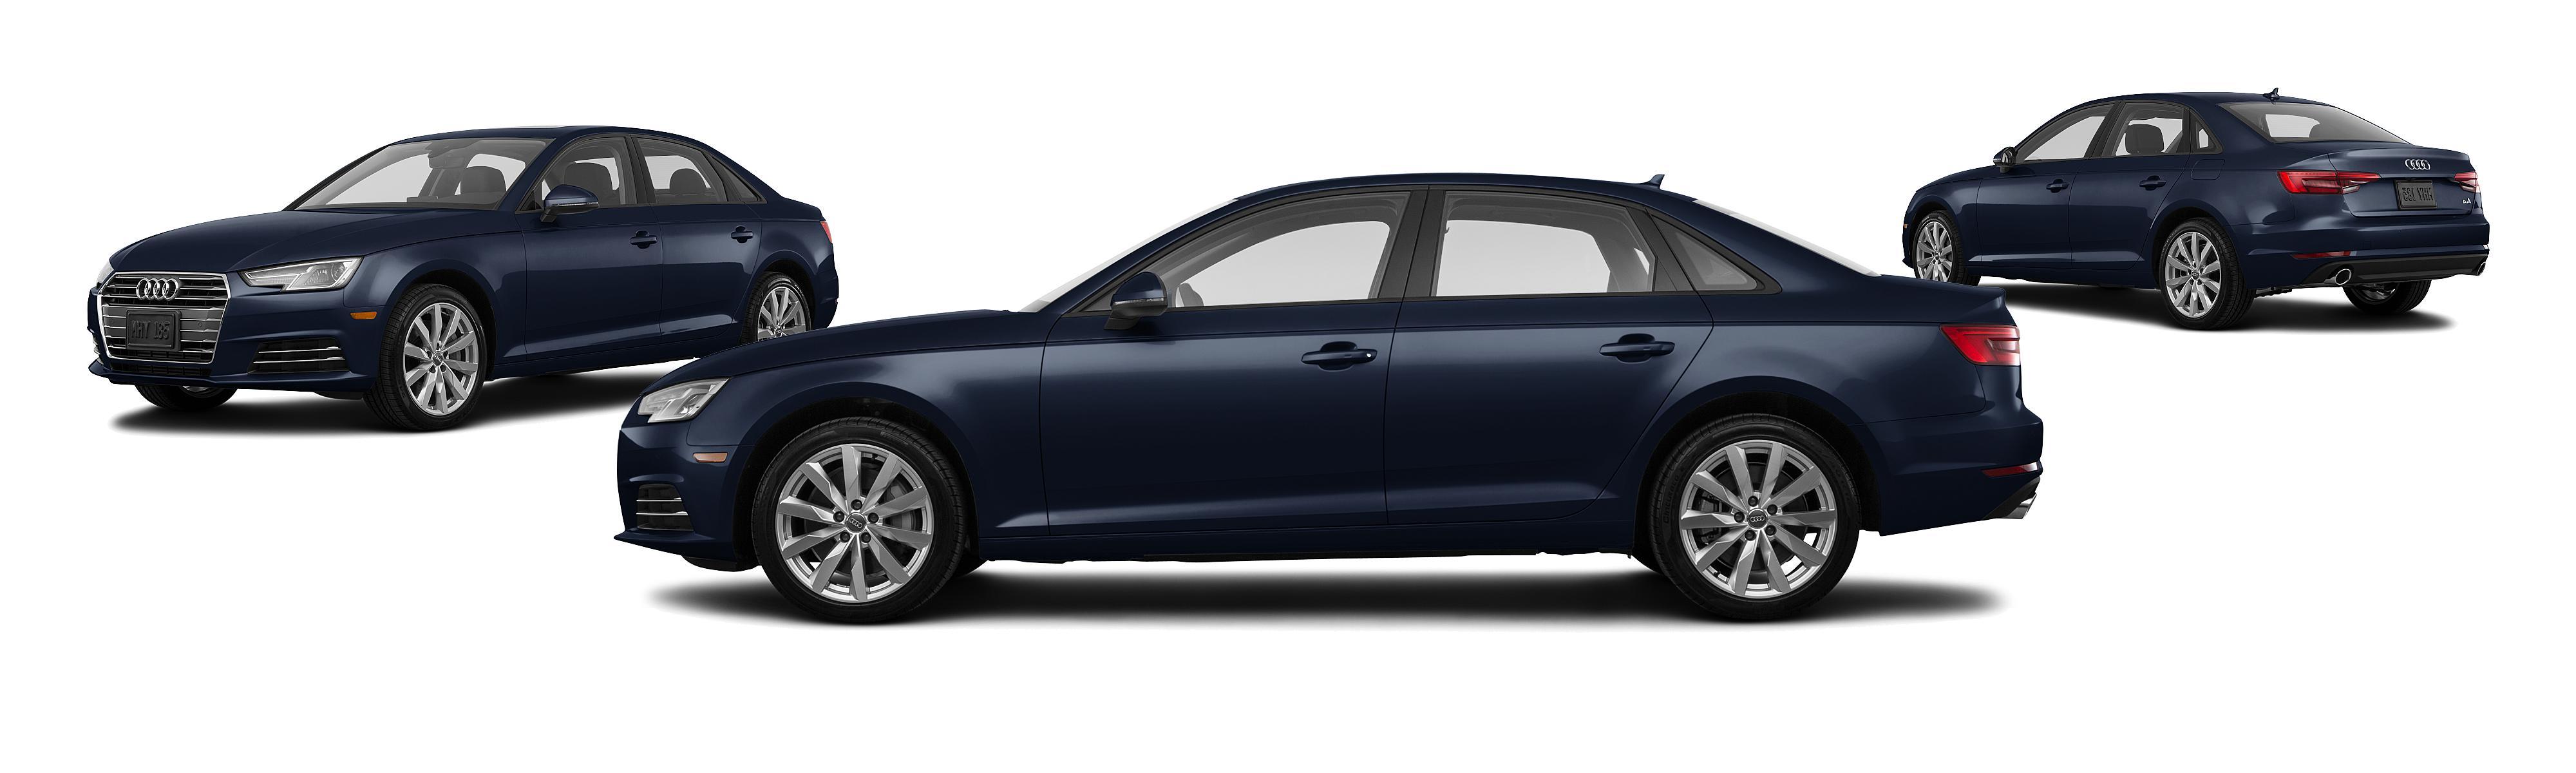 2017 audi a4 2 0t premium 4dr sedan research groovecar rh groovecar com